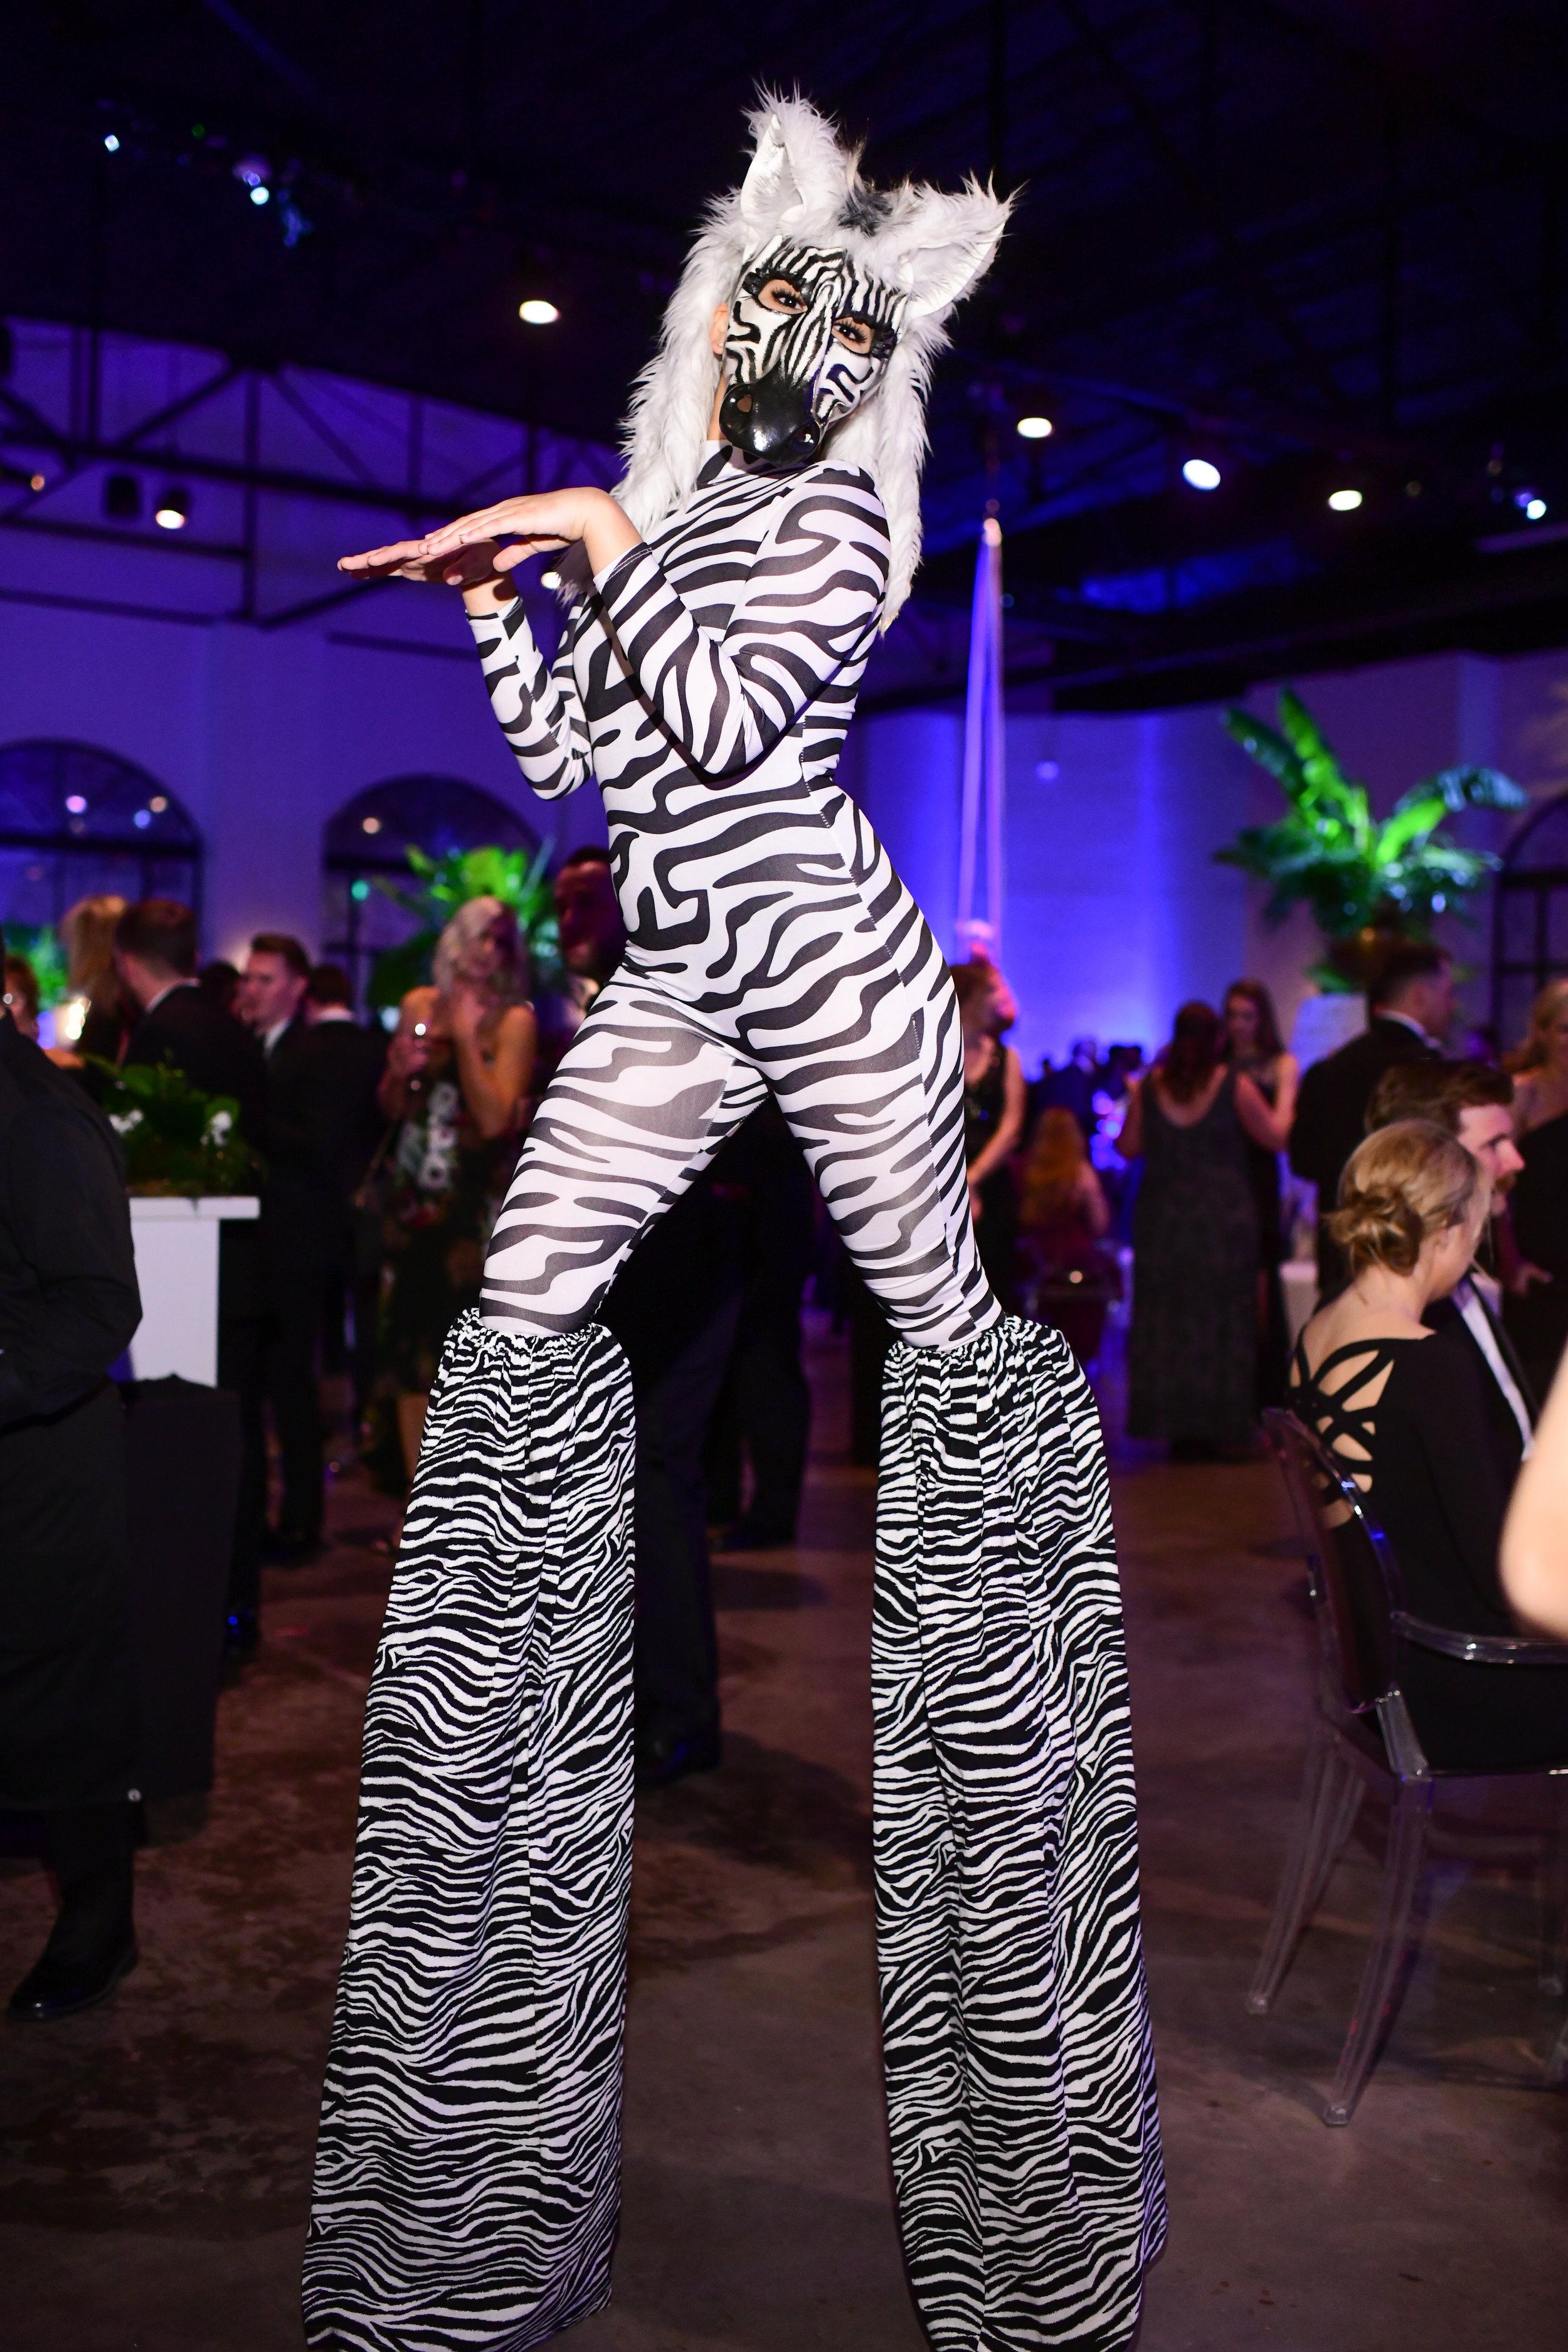 Zebra on stilts; Photo by Daniel Ortiz.jpg